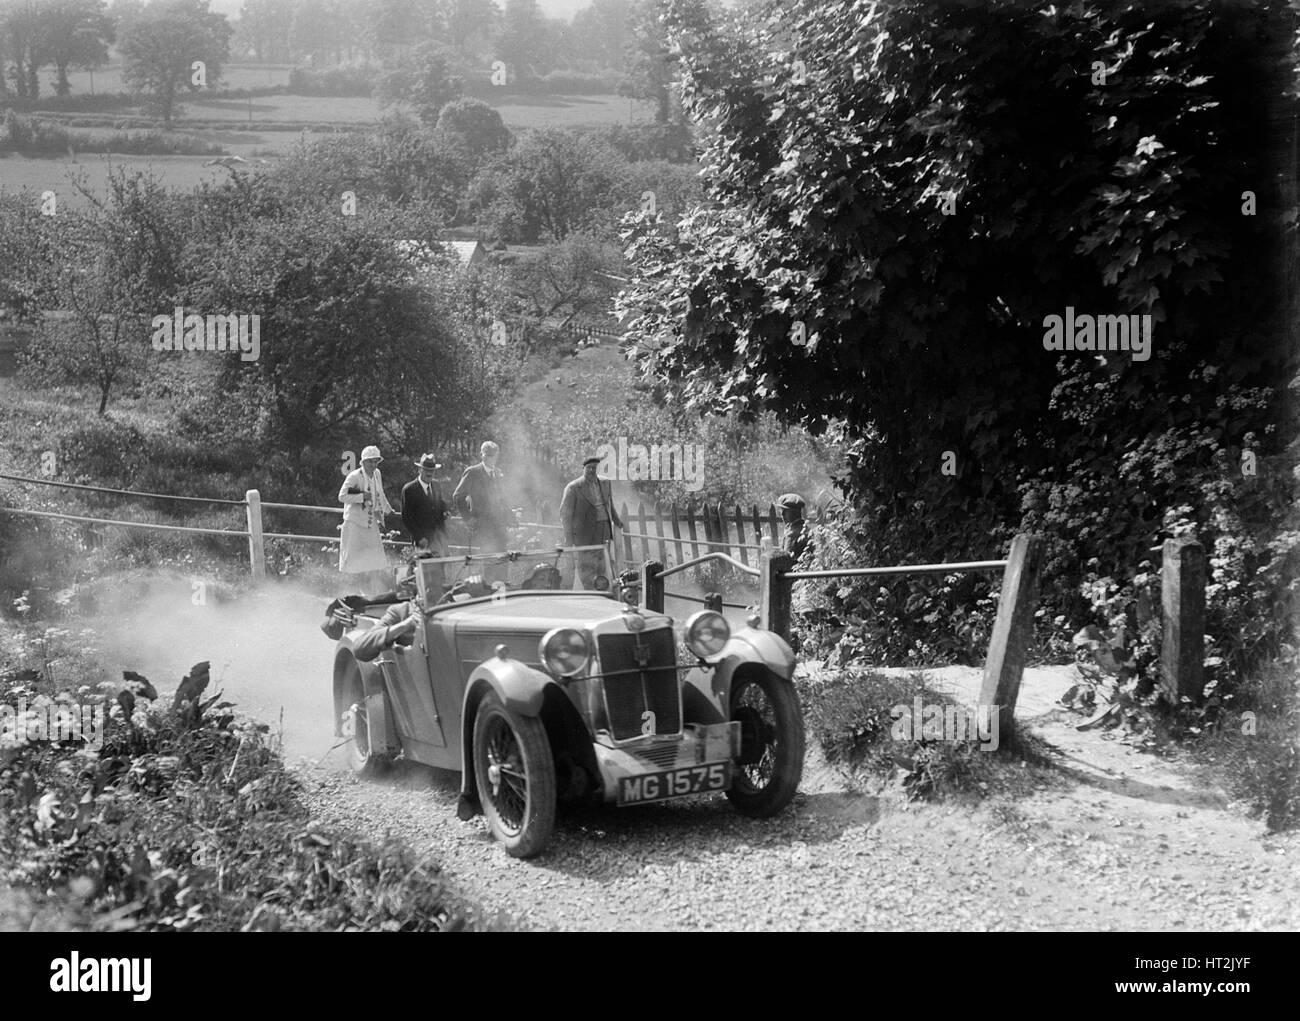 MG Magna taking part in a West Hants Light Car Club Trial, Ibberton Hill, Dorset, 1930s. Artist: Bill Brunell. - Stock Image